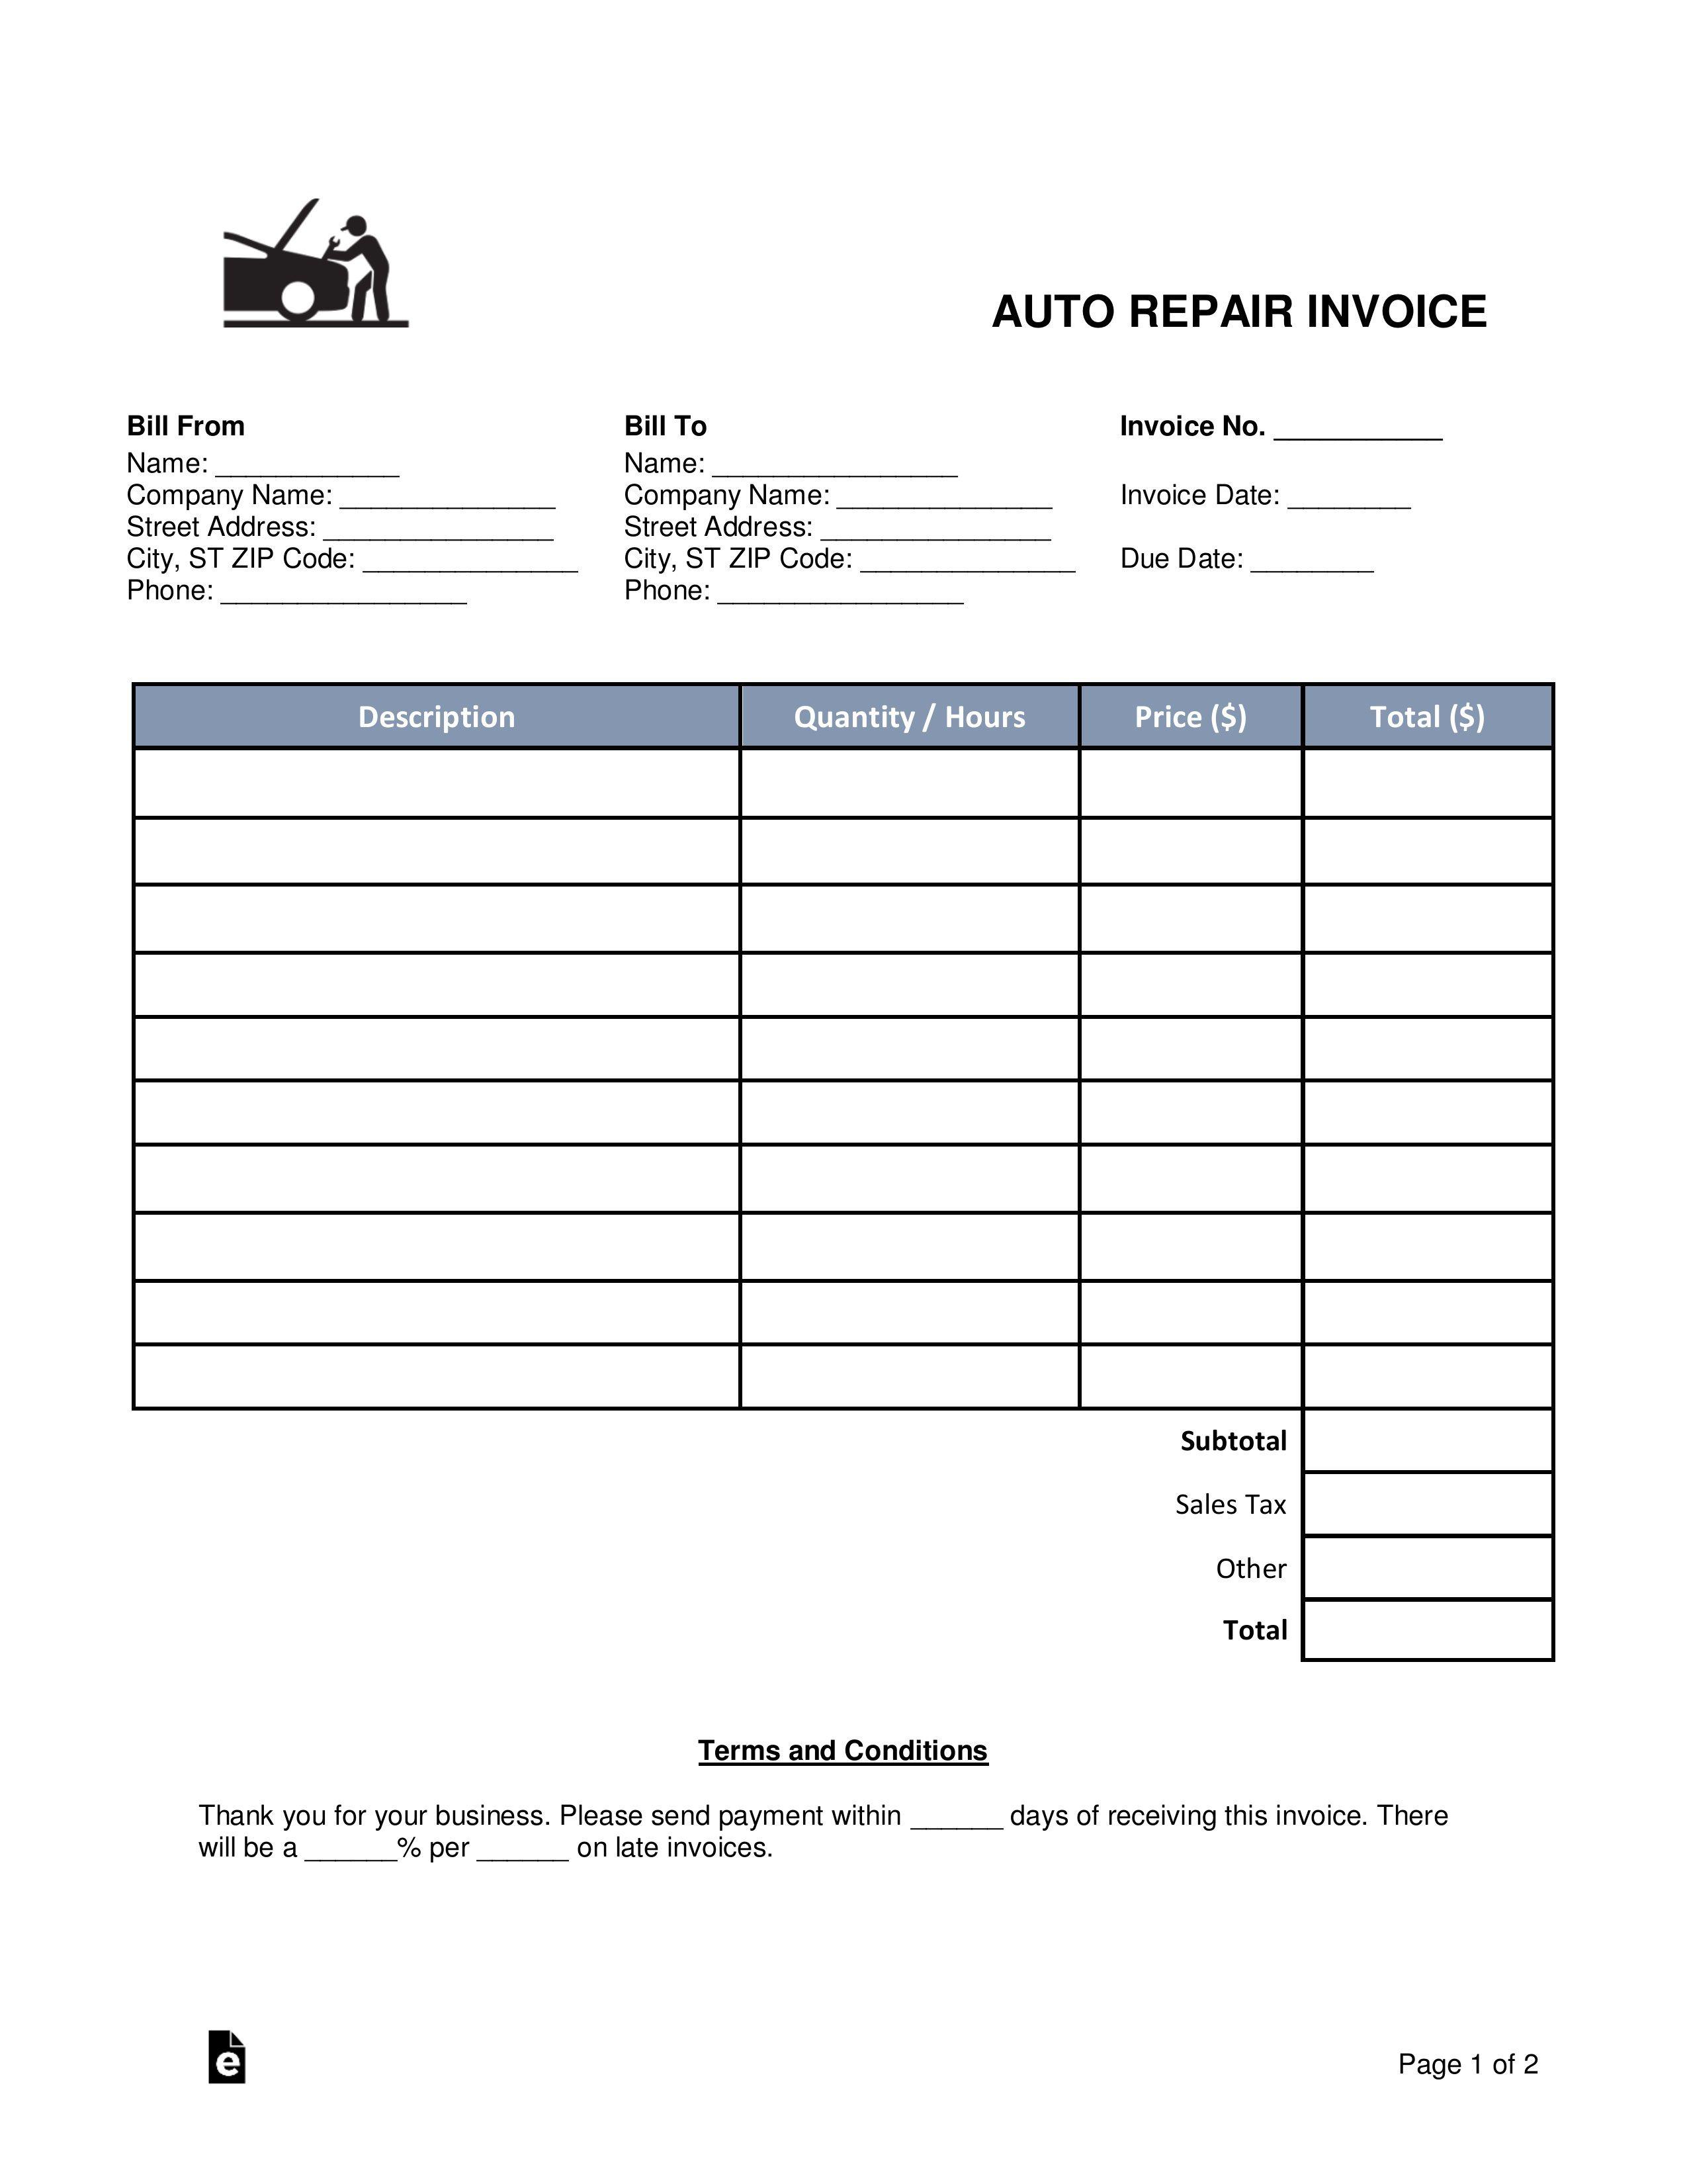 Free Auto Repair Invoice Template Word Addictionary